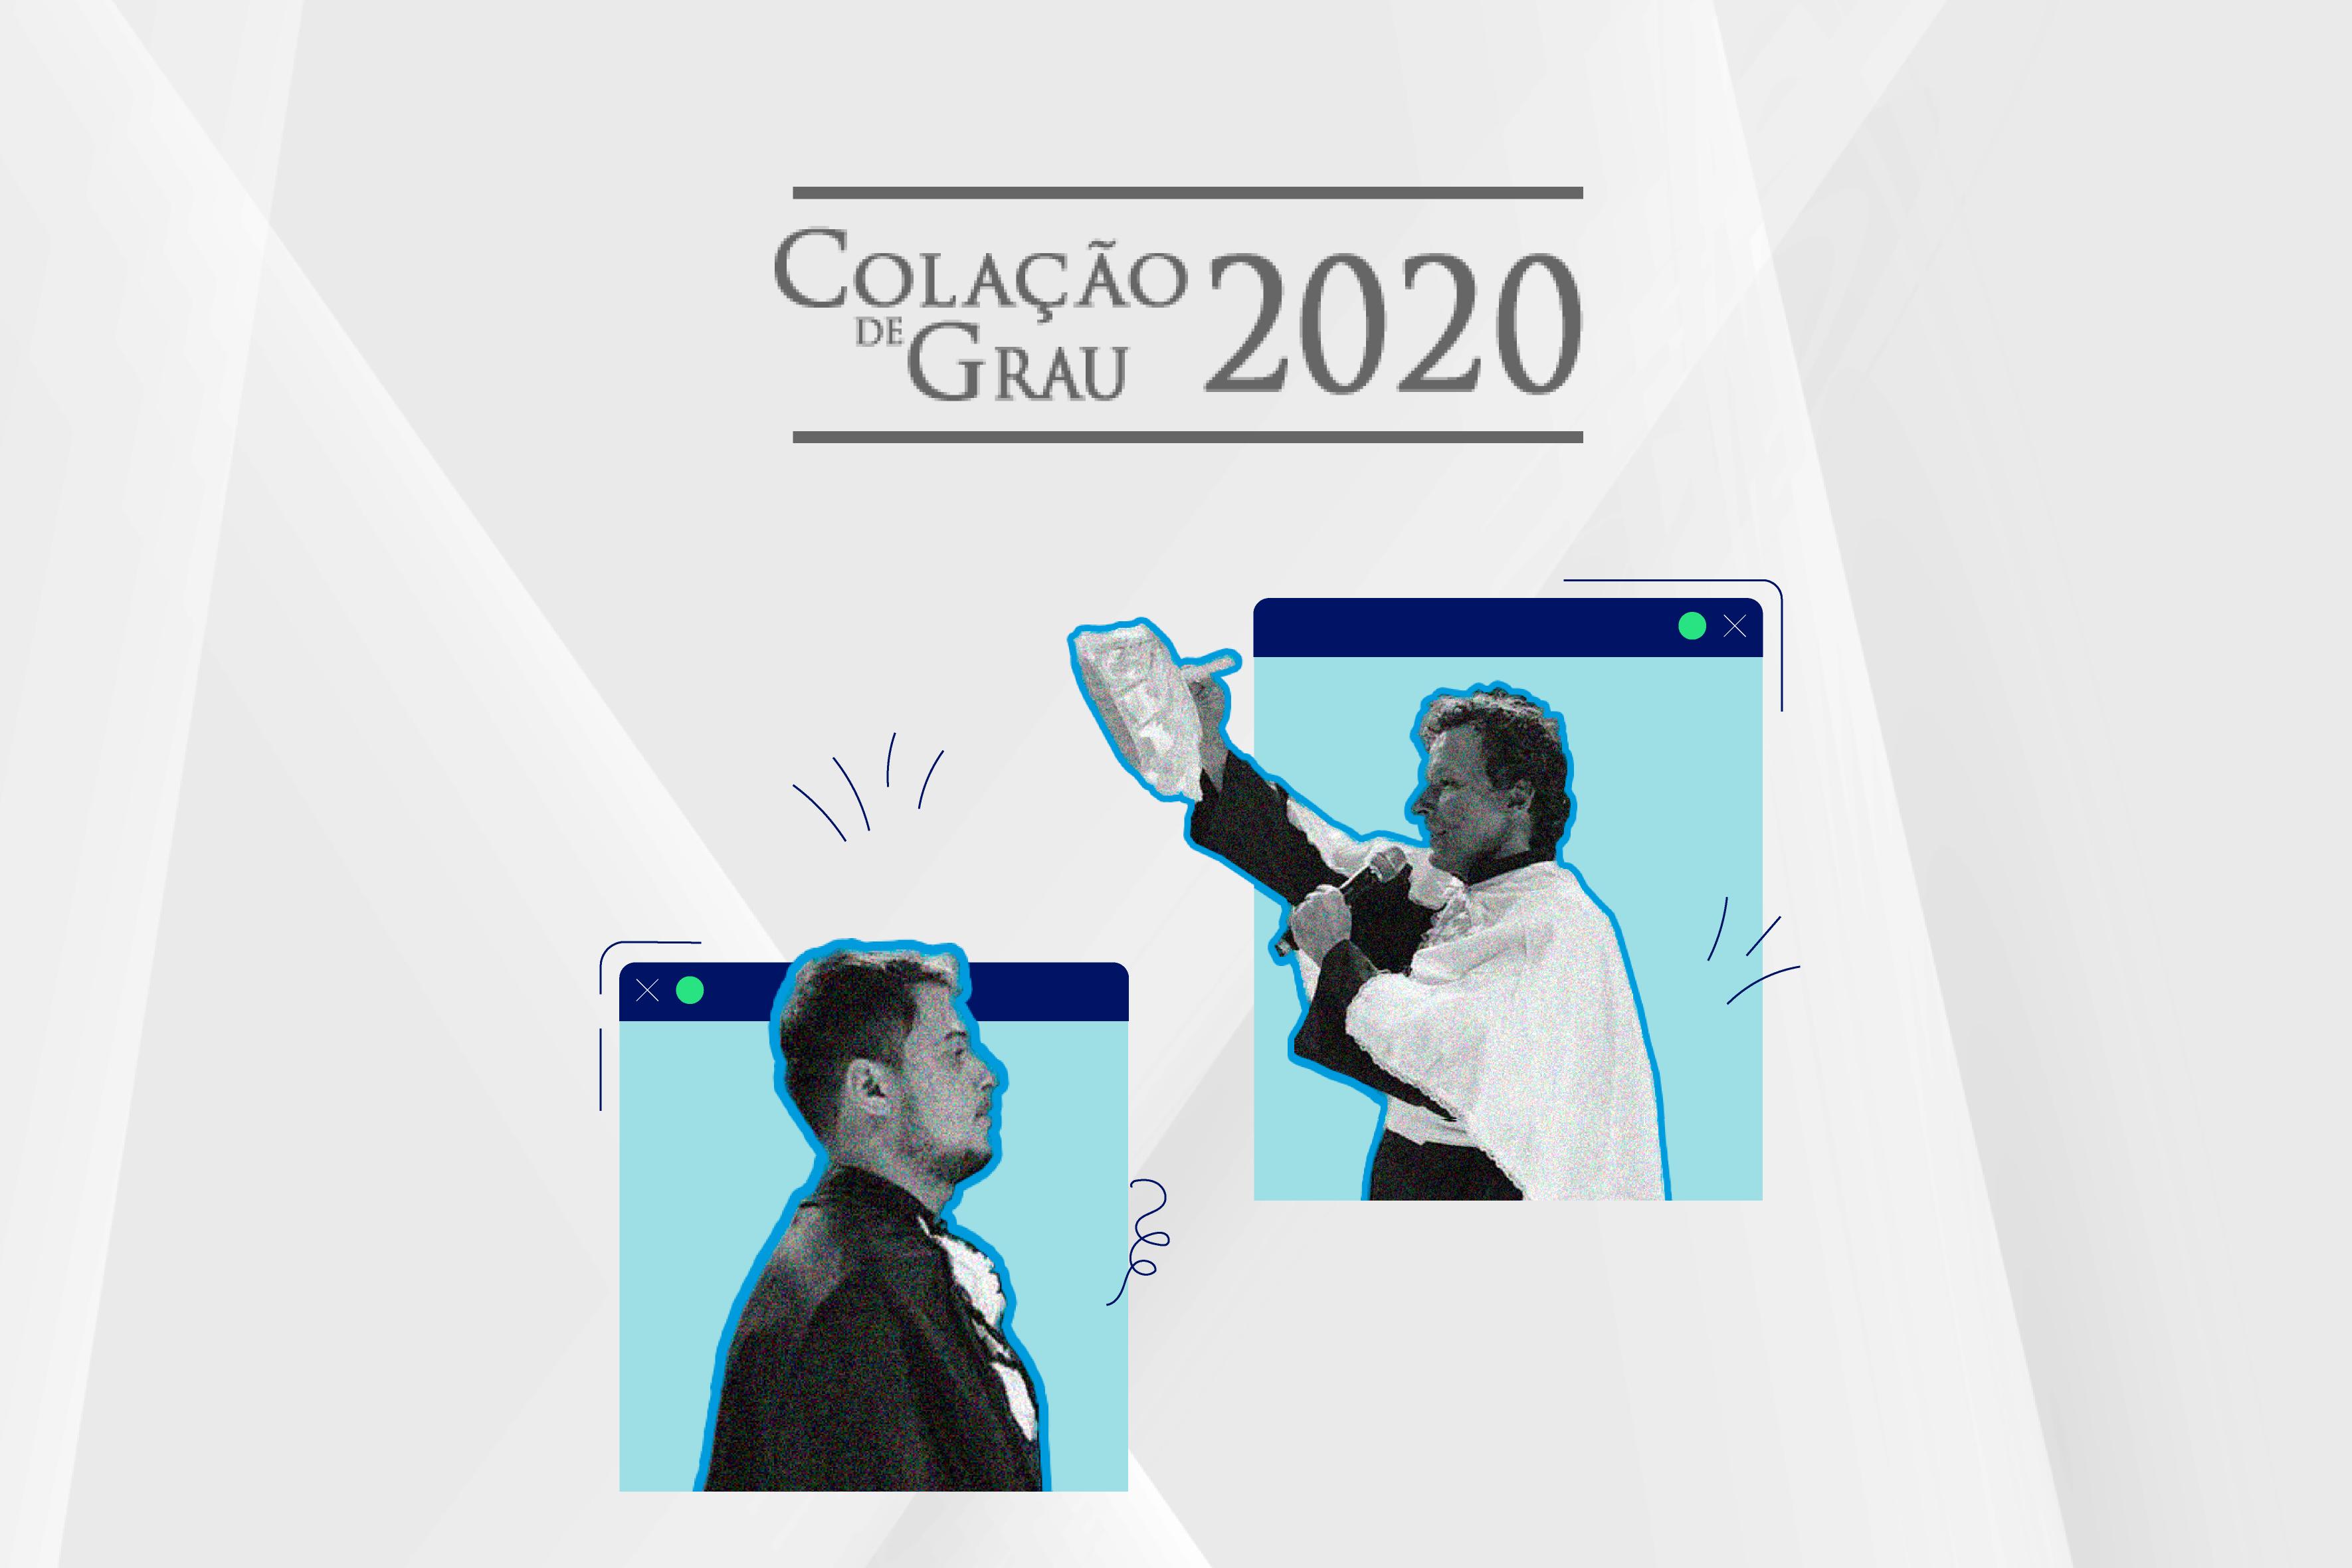 colaçã-2020-uniacademia